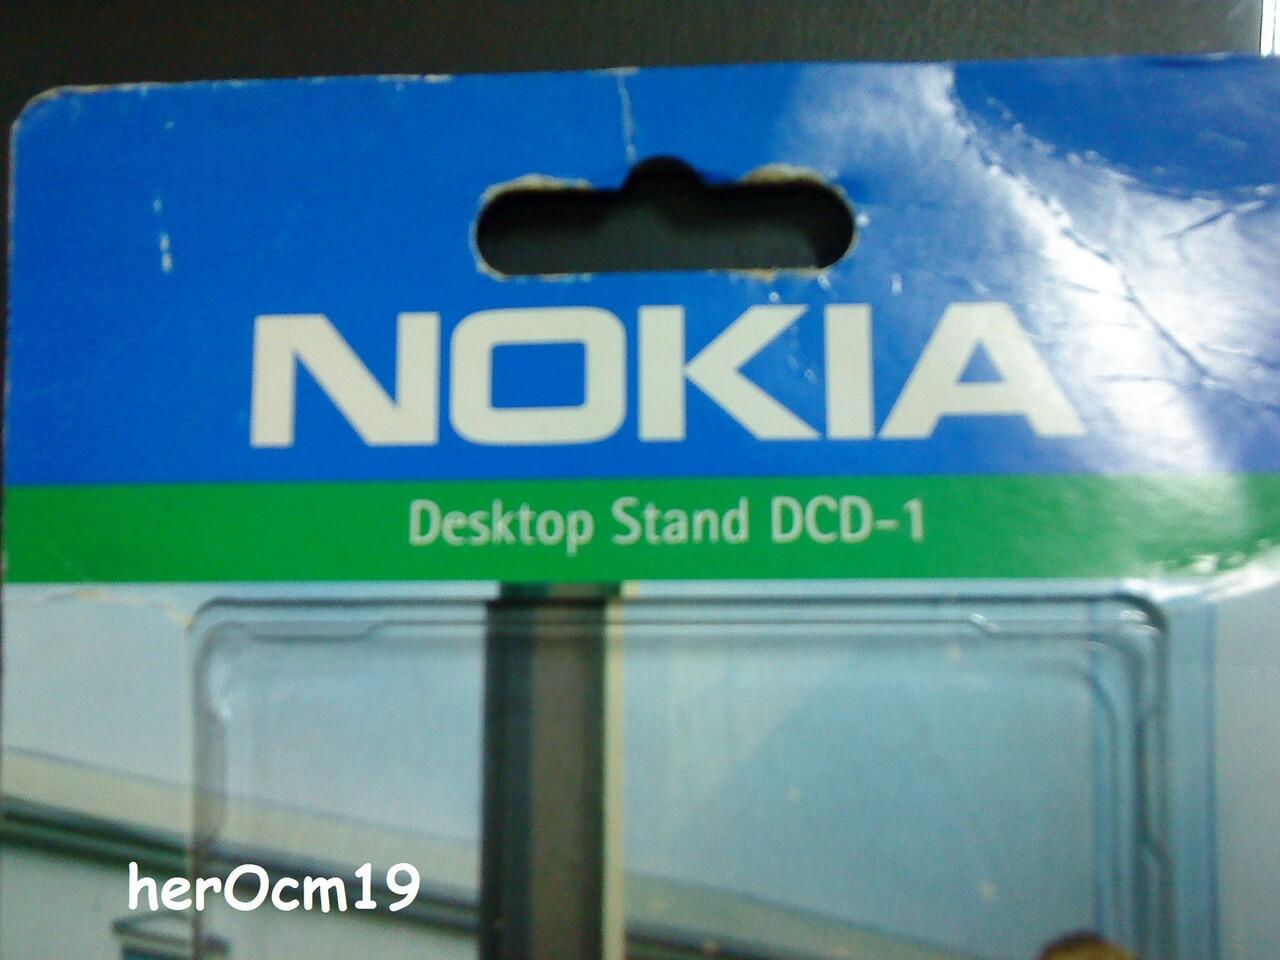 Desktop Stand DCD-1 for nokia 8310/6510